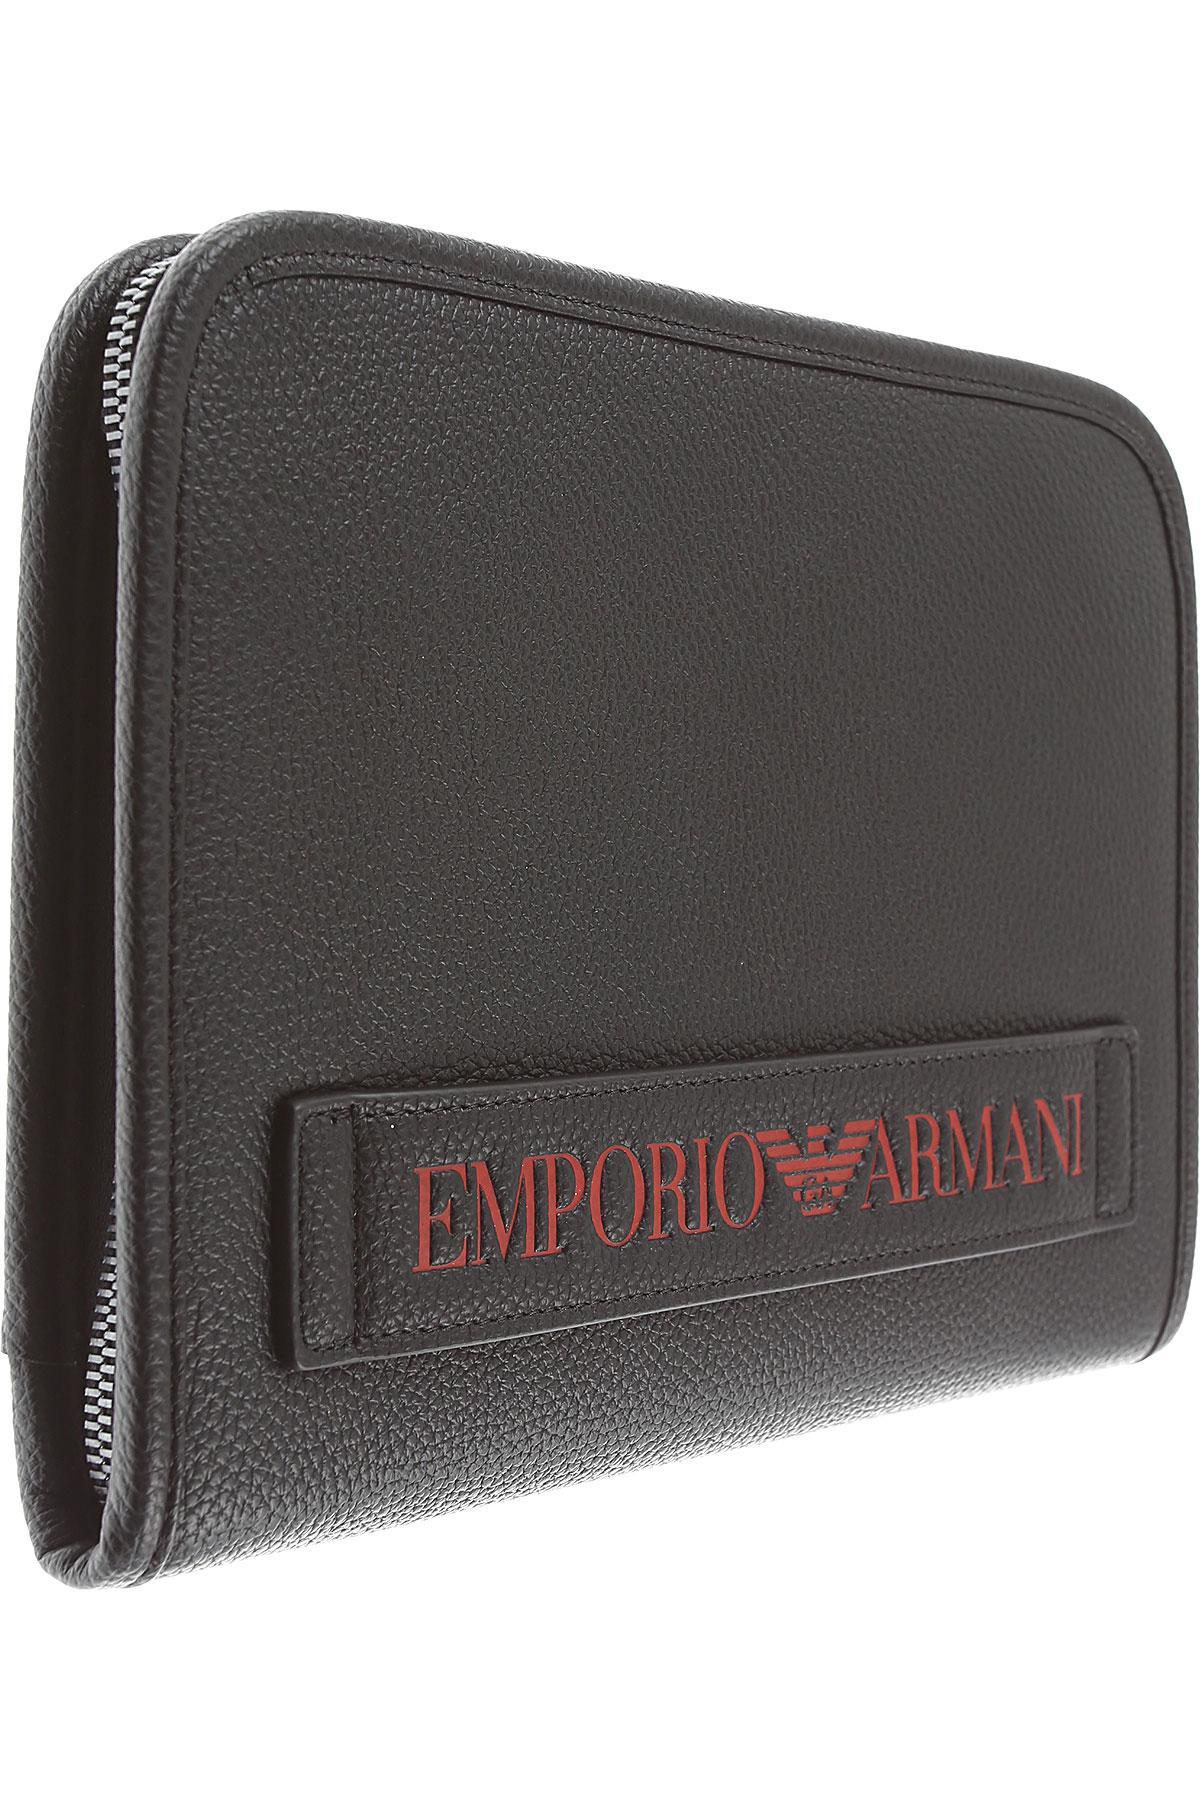 4fdb49ffb3 Lyst - Emporio Armani Wallet For Men in Black for Men